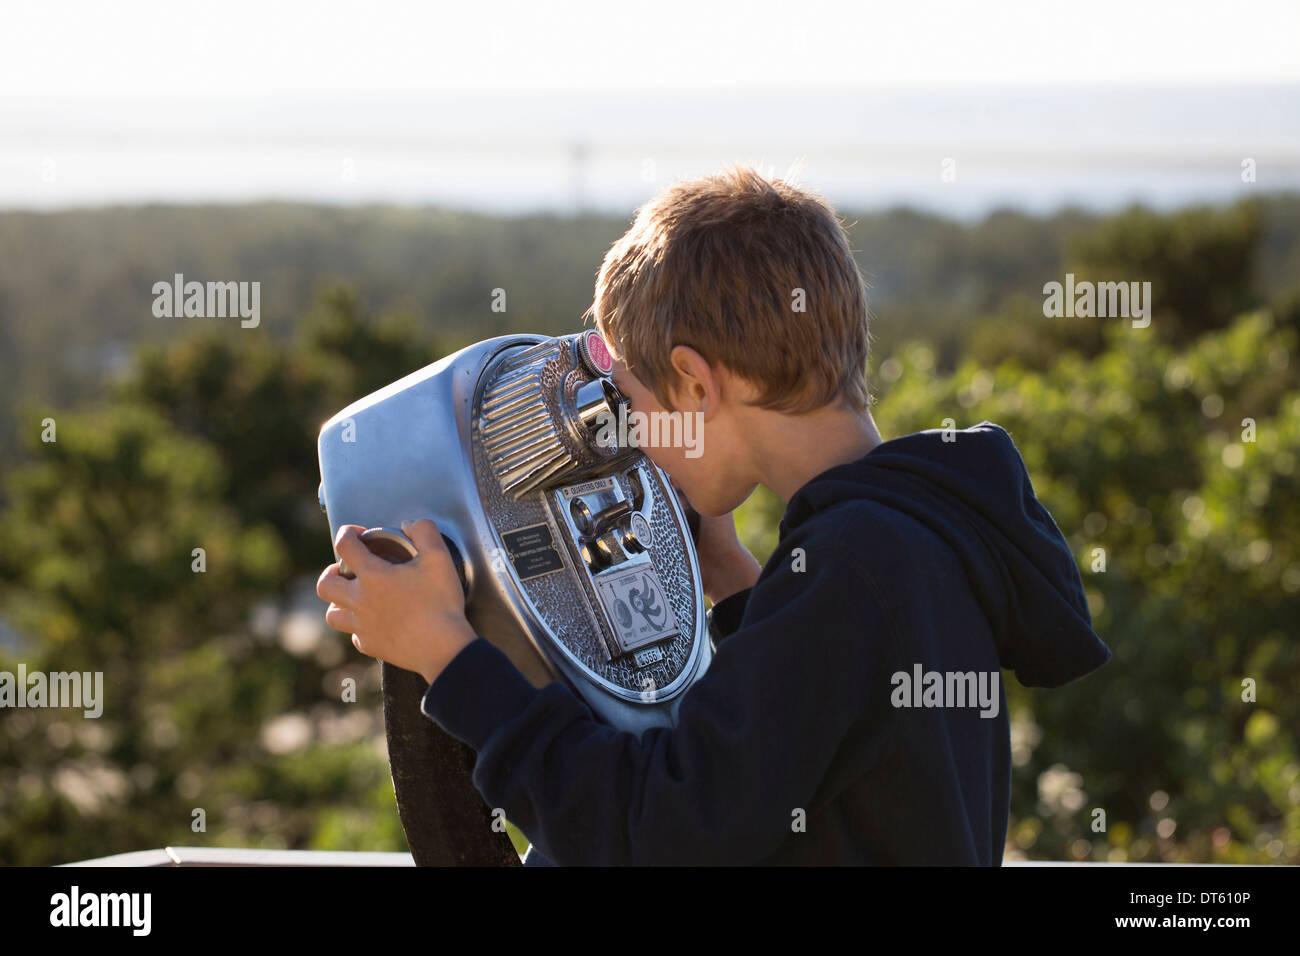 Boy using coin operated binoculars - Stock Image